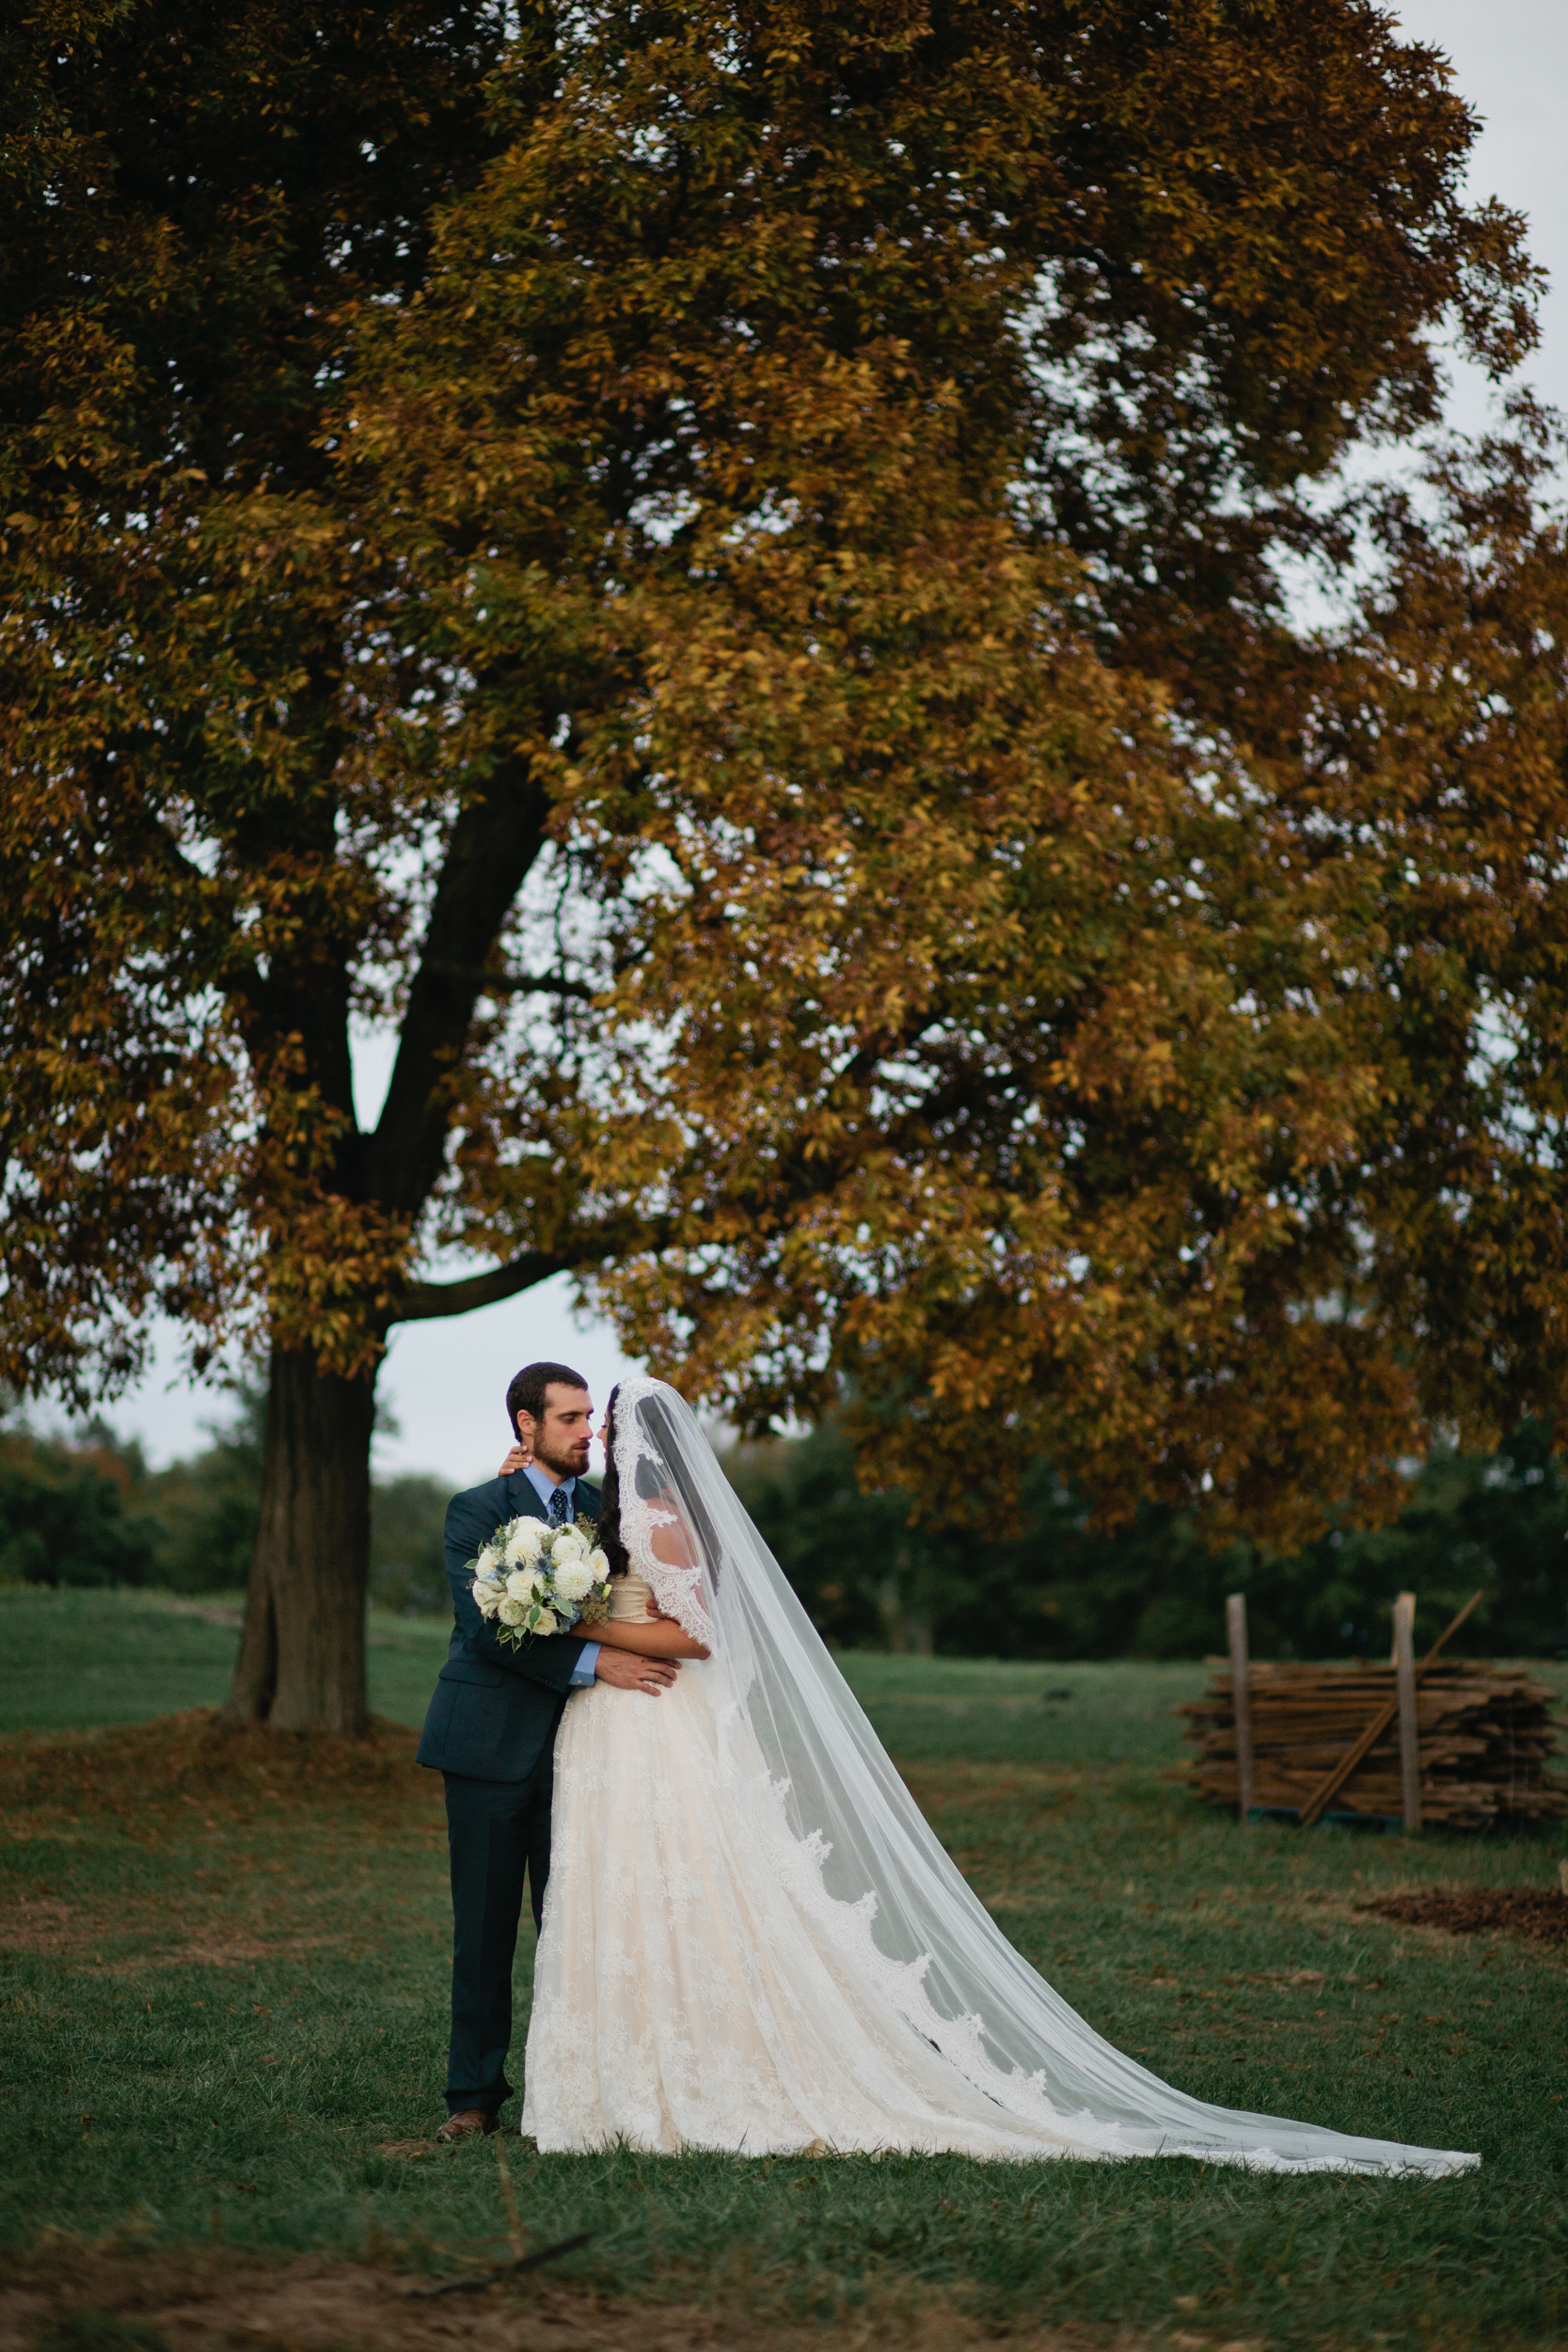 Best-Maine-Wedding-Photographer-1088.jpg